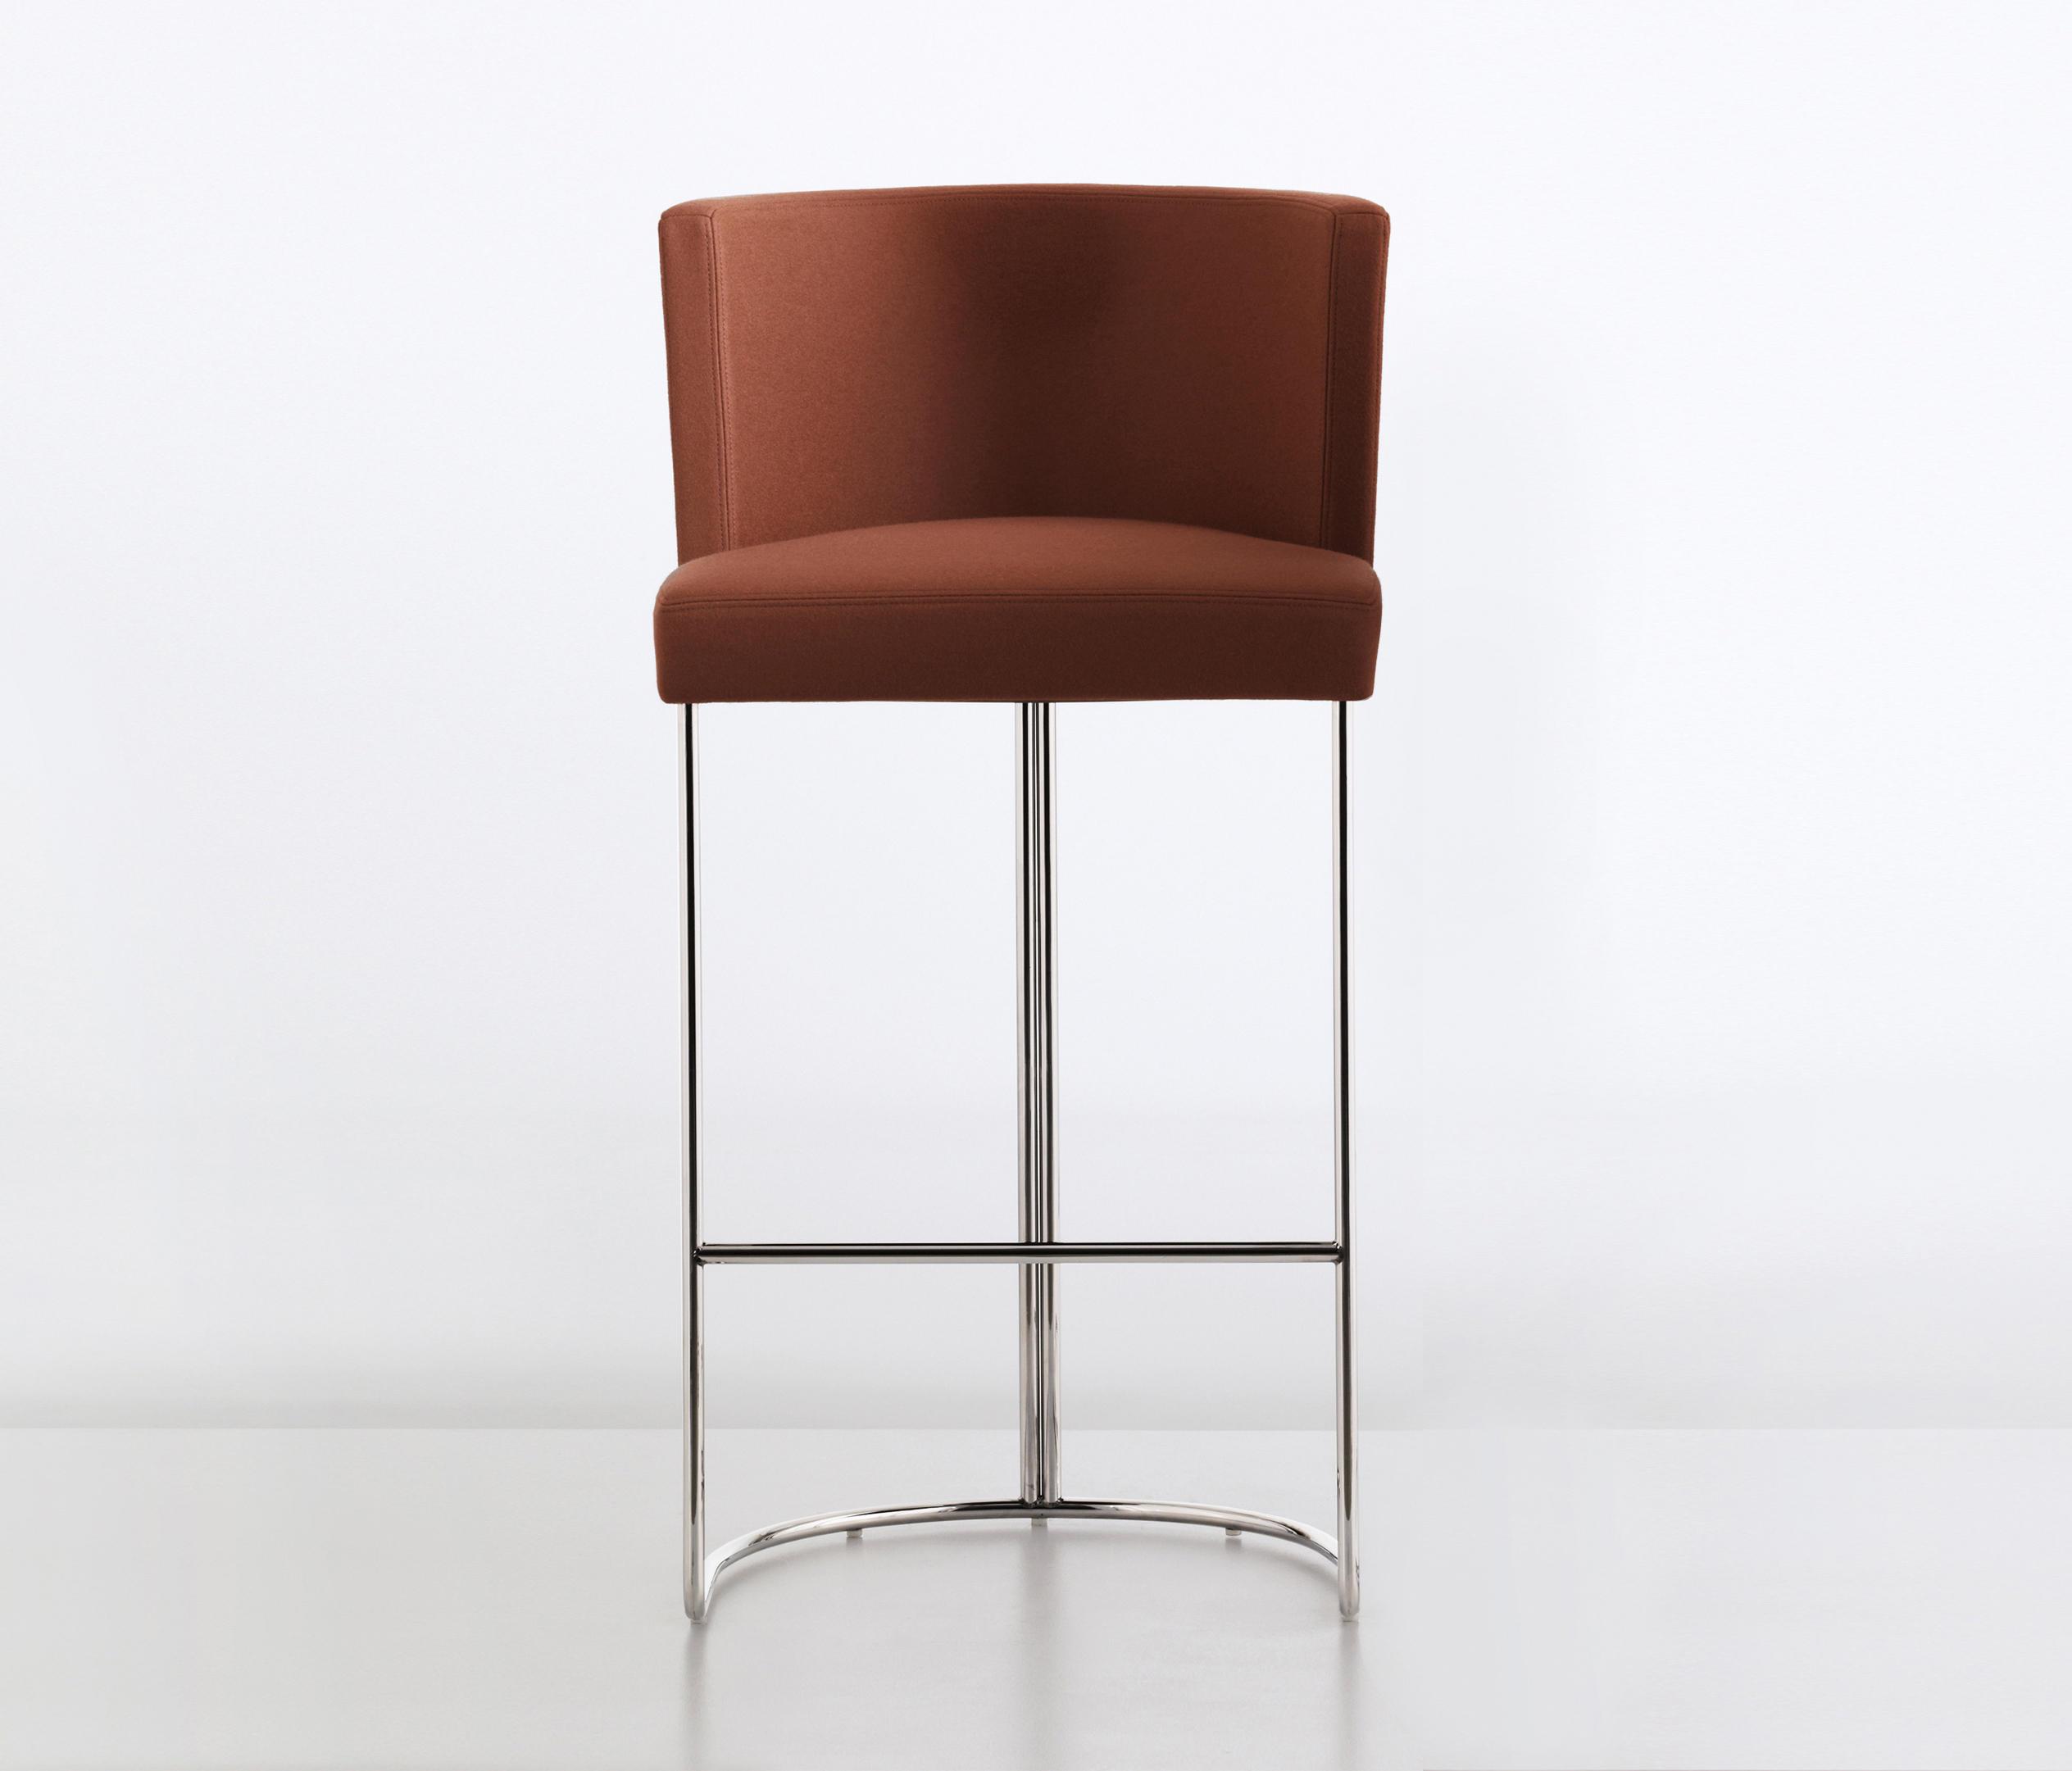 Lloyd stool barhocker von cumberland furniture for Barhocker usa